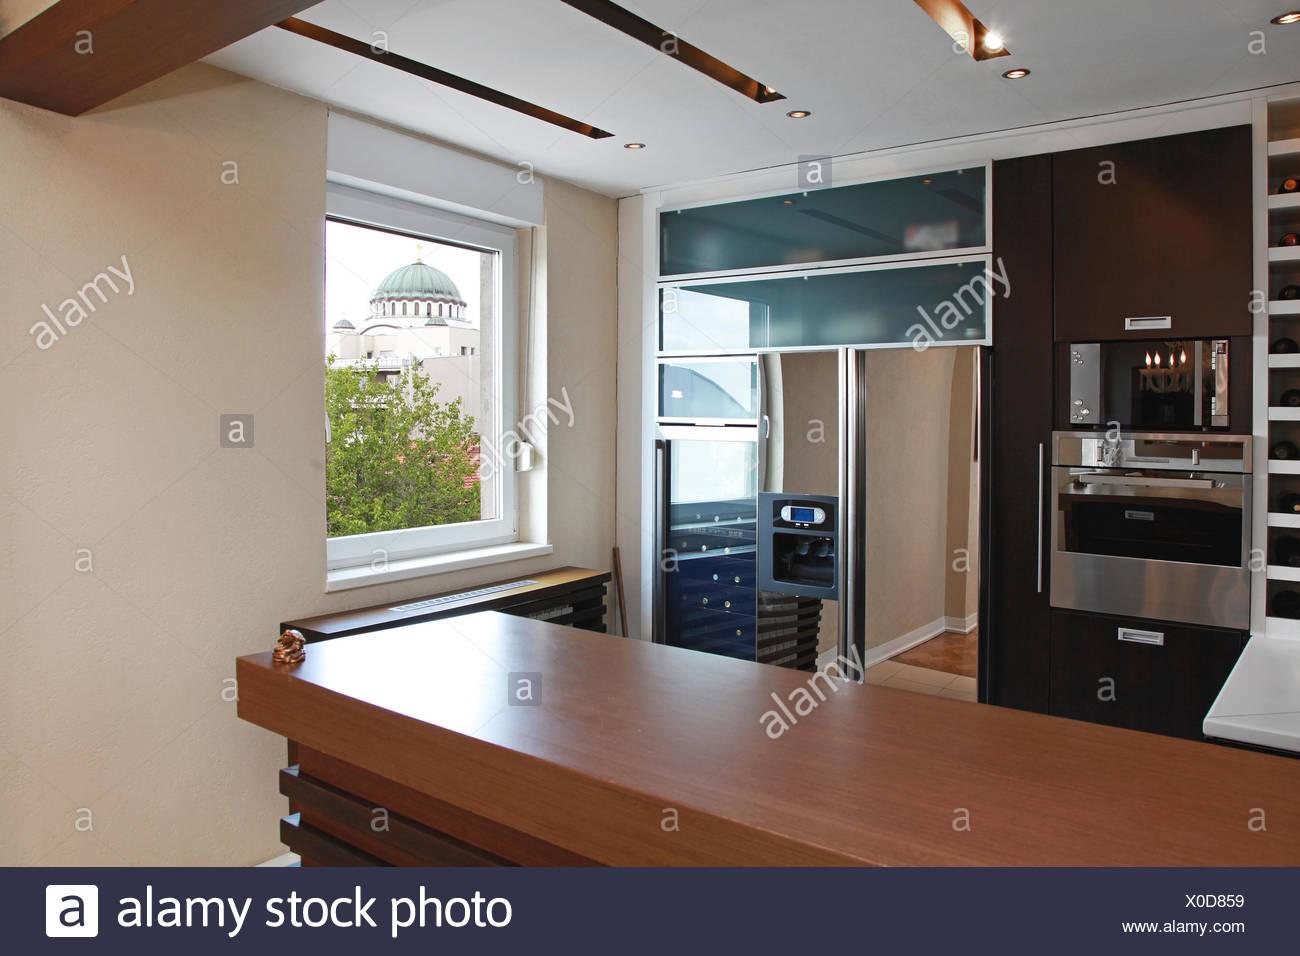 Küche-Bar Stockfoto, Bild: 275657685 - Alamy